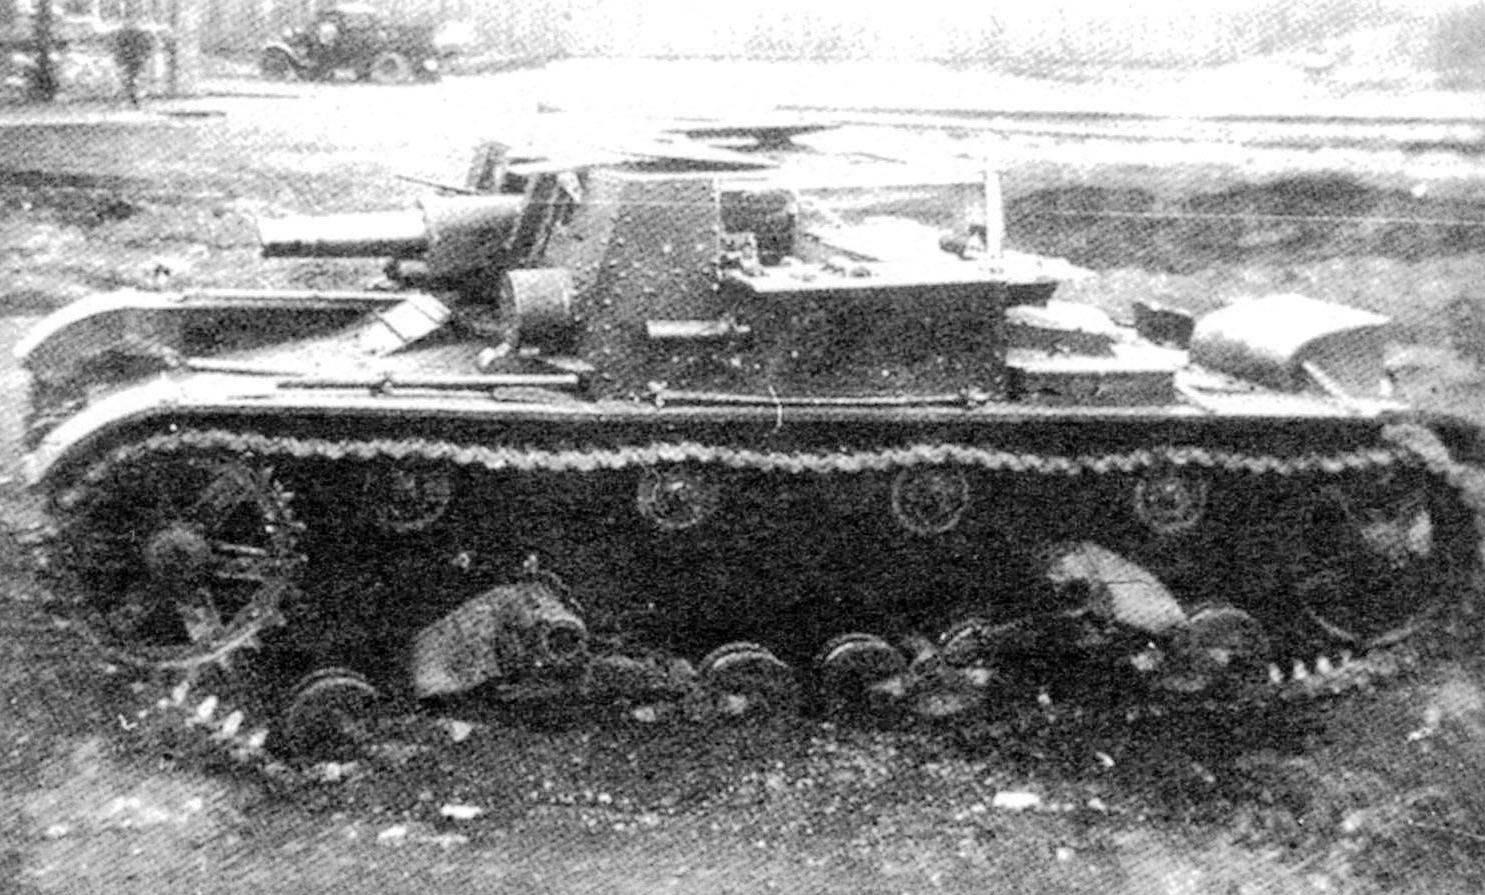 Артиллерийский танк АТ-1, спроектированный на шасси танка Т-26